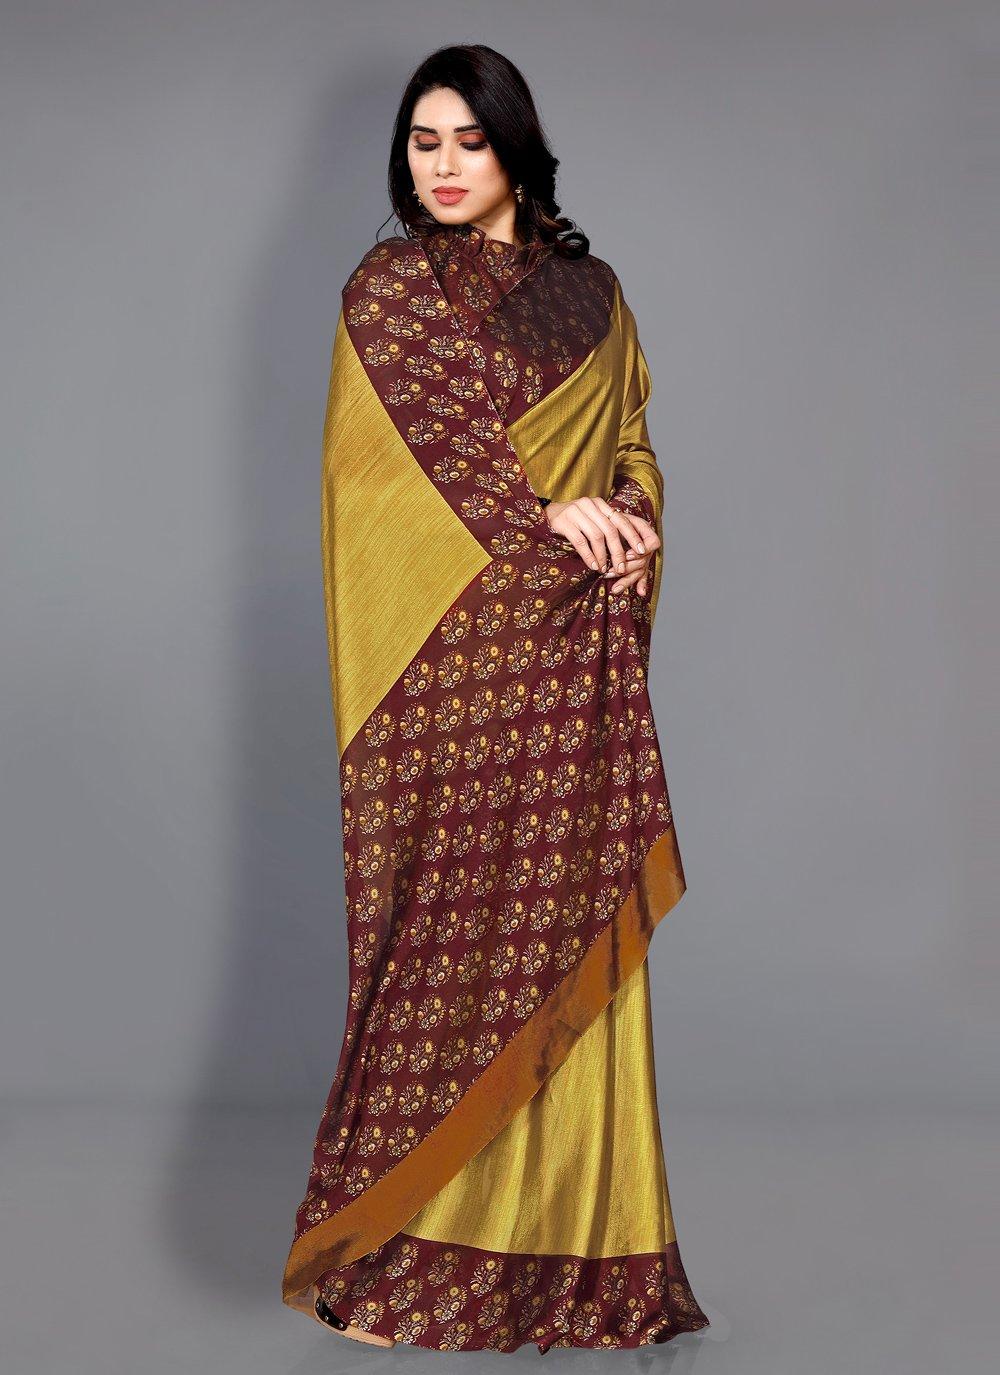 Maroon and Yellow Faux Chiffon Traditional Saree